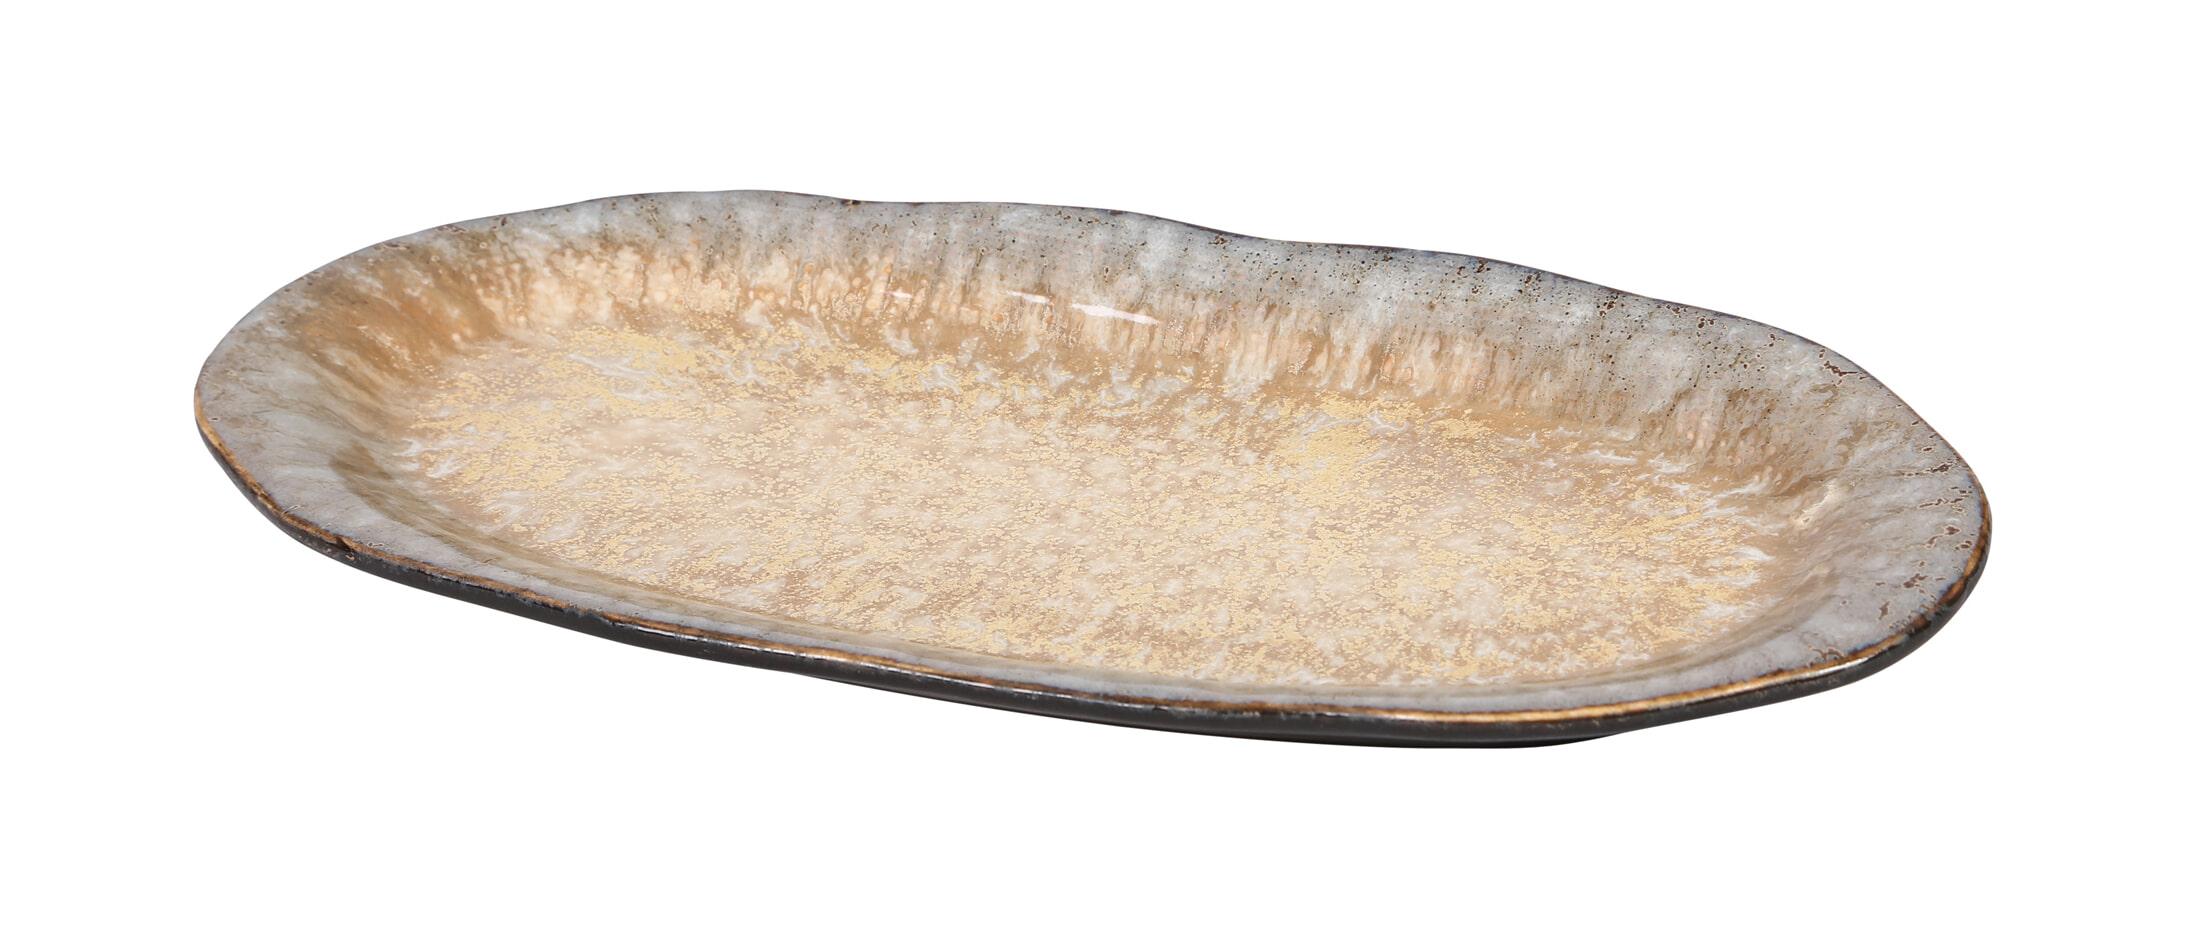 PTMD Bord 'Candice', Keramiek, 25 x 11.5 x 2.4cm, kleur Crème